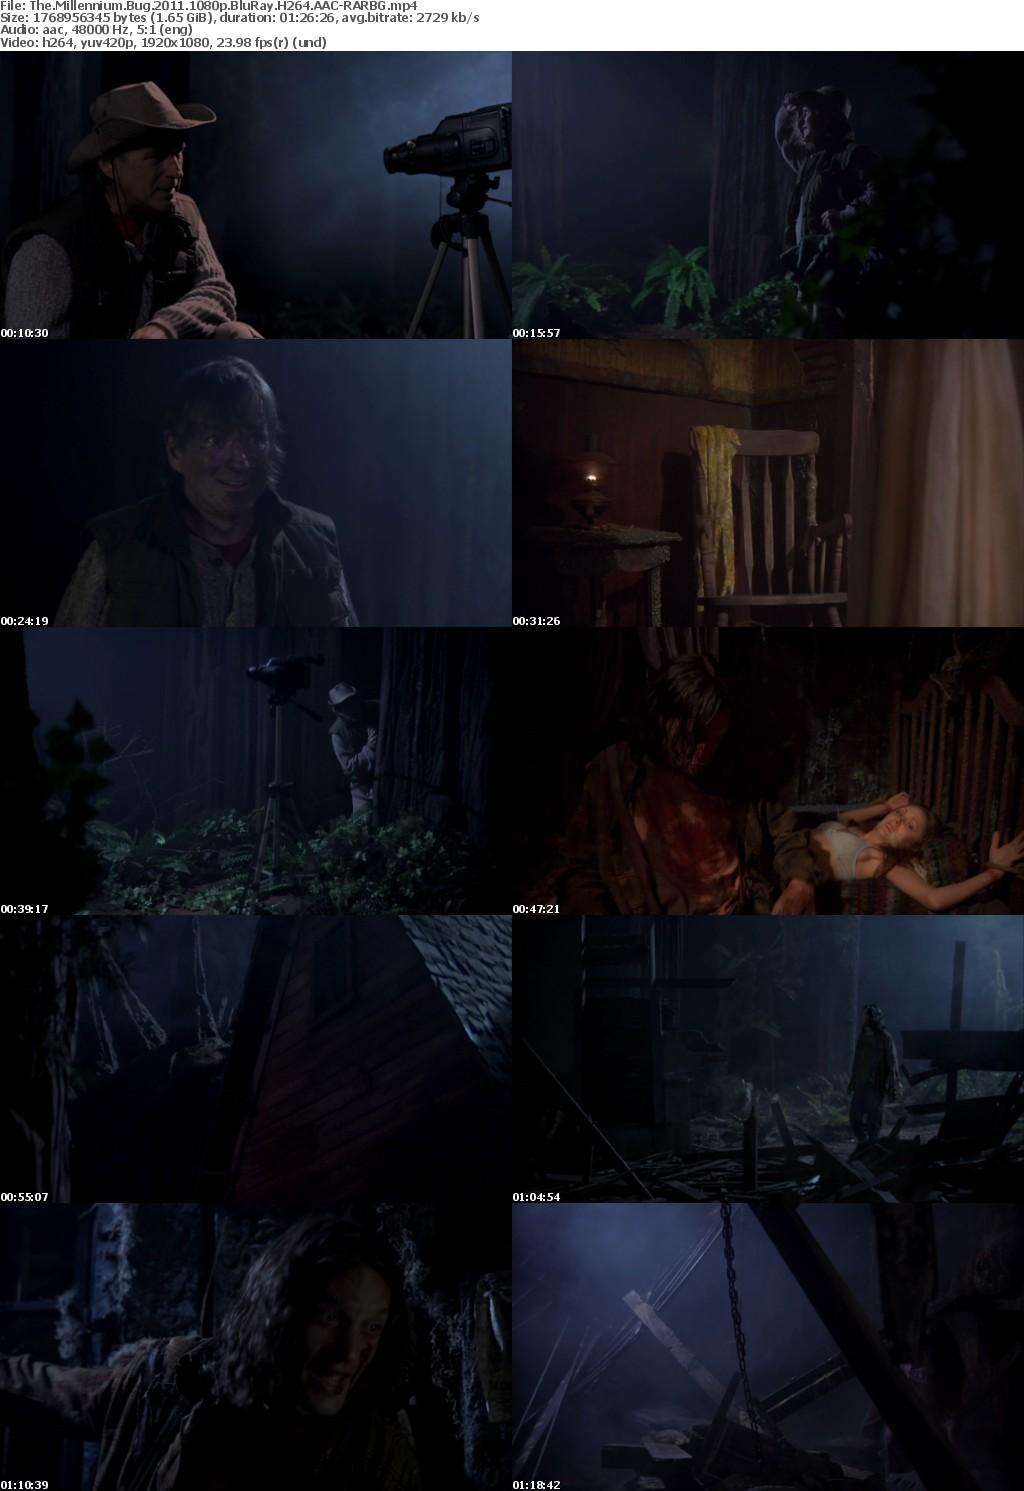 The Millennium Bug (2011) 1080p BluRay H264 AAC-RARBG